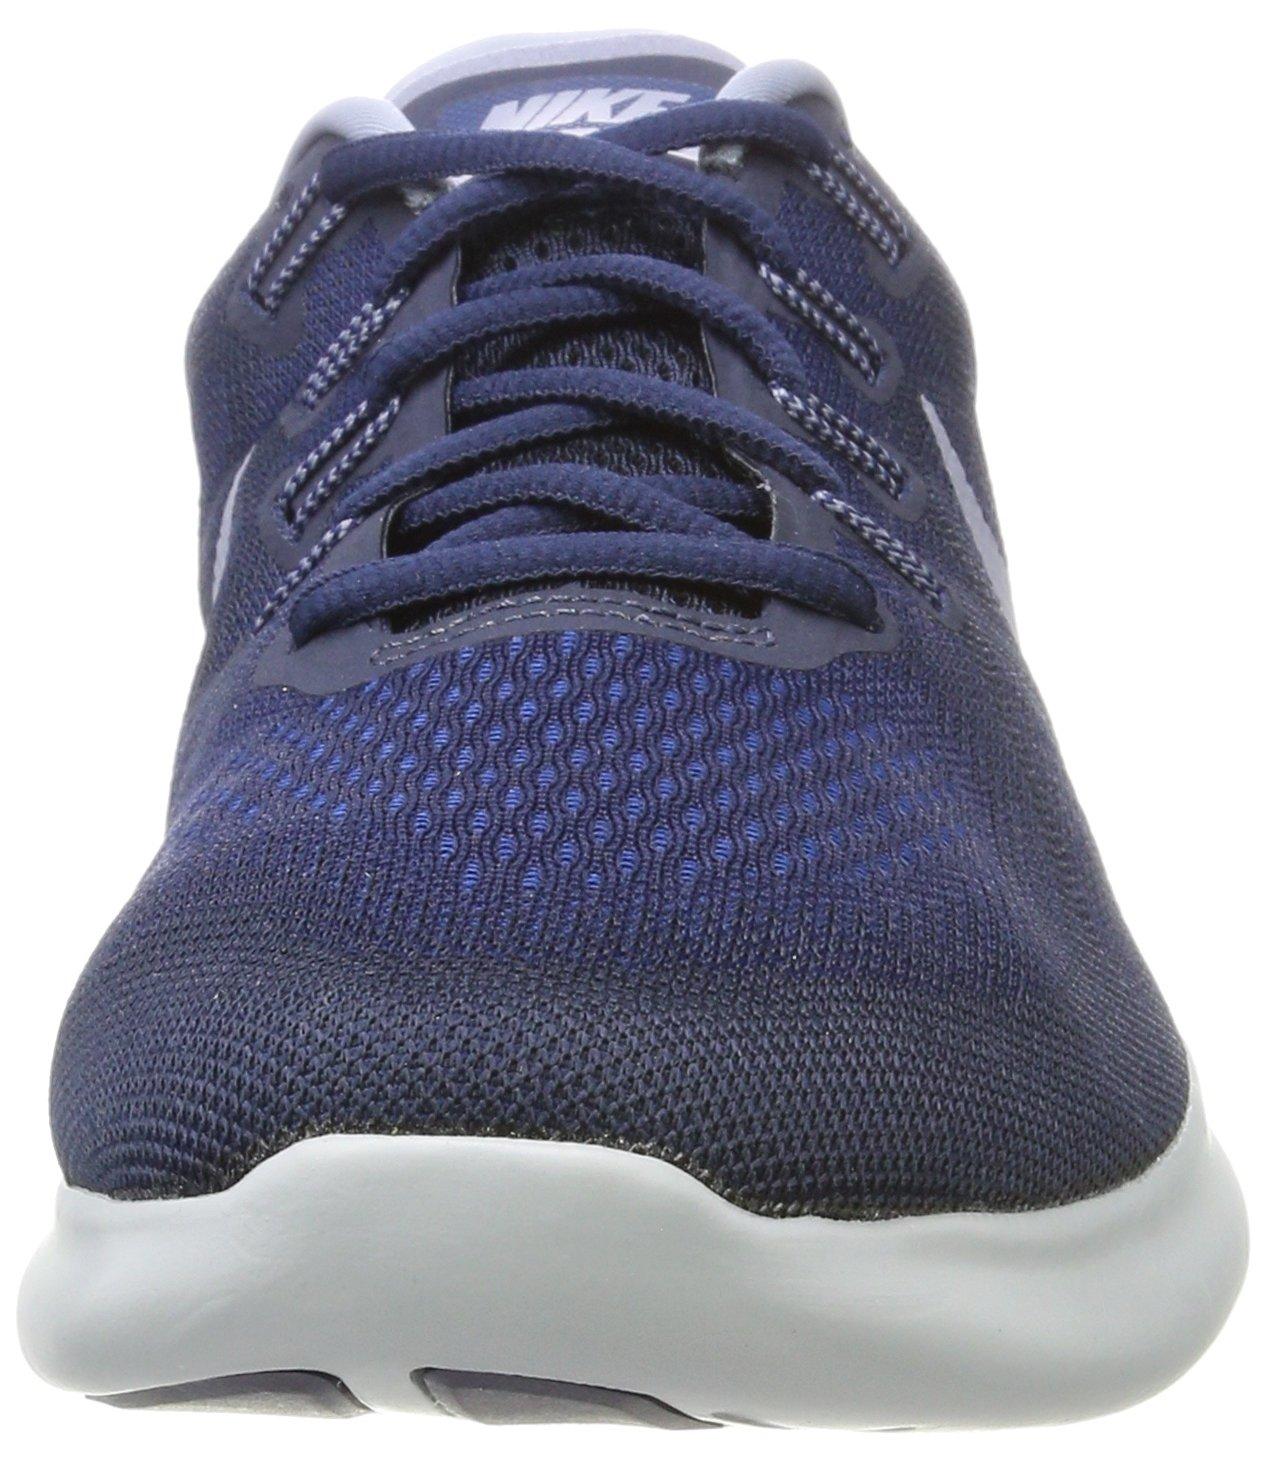 Nike ''Free RN'' 2017 Binary Blue/Dark Sky Blue 8 by Nike (Image #4)